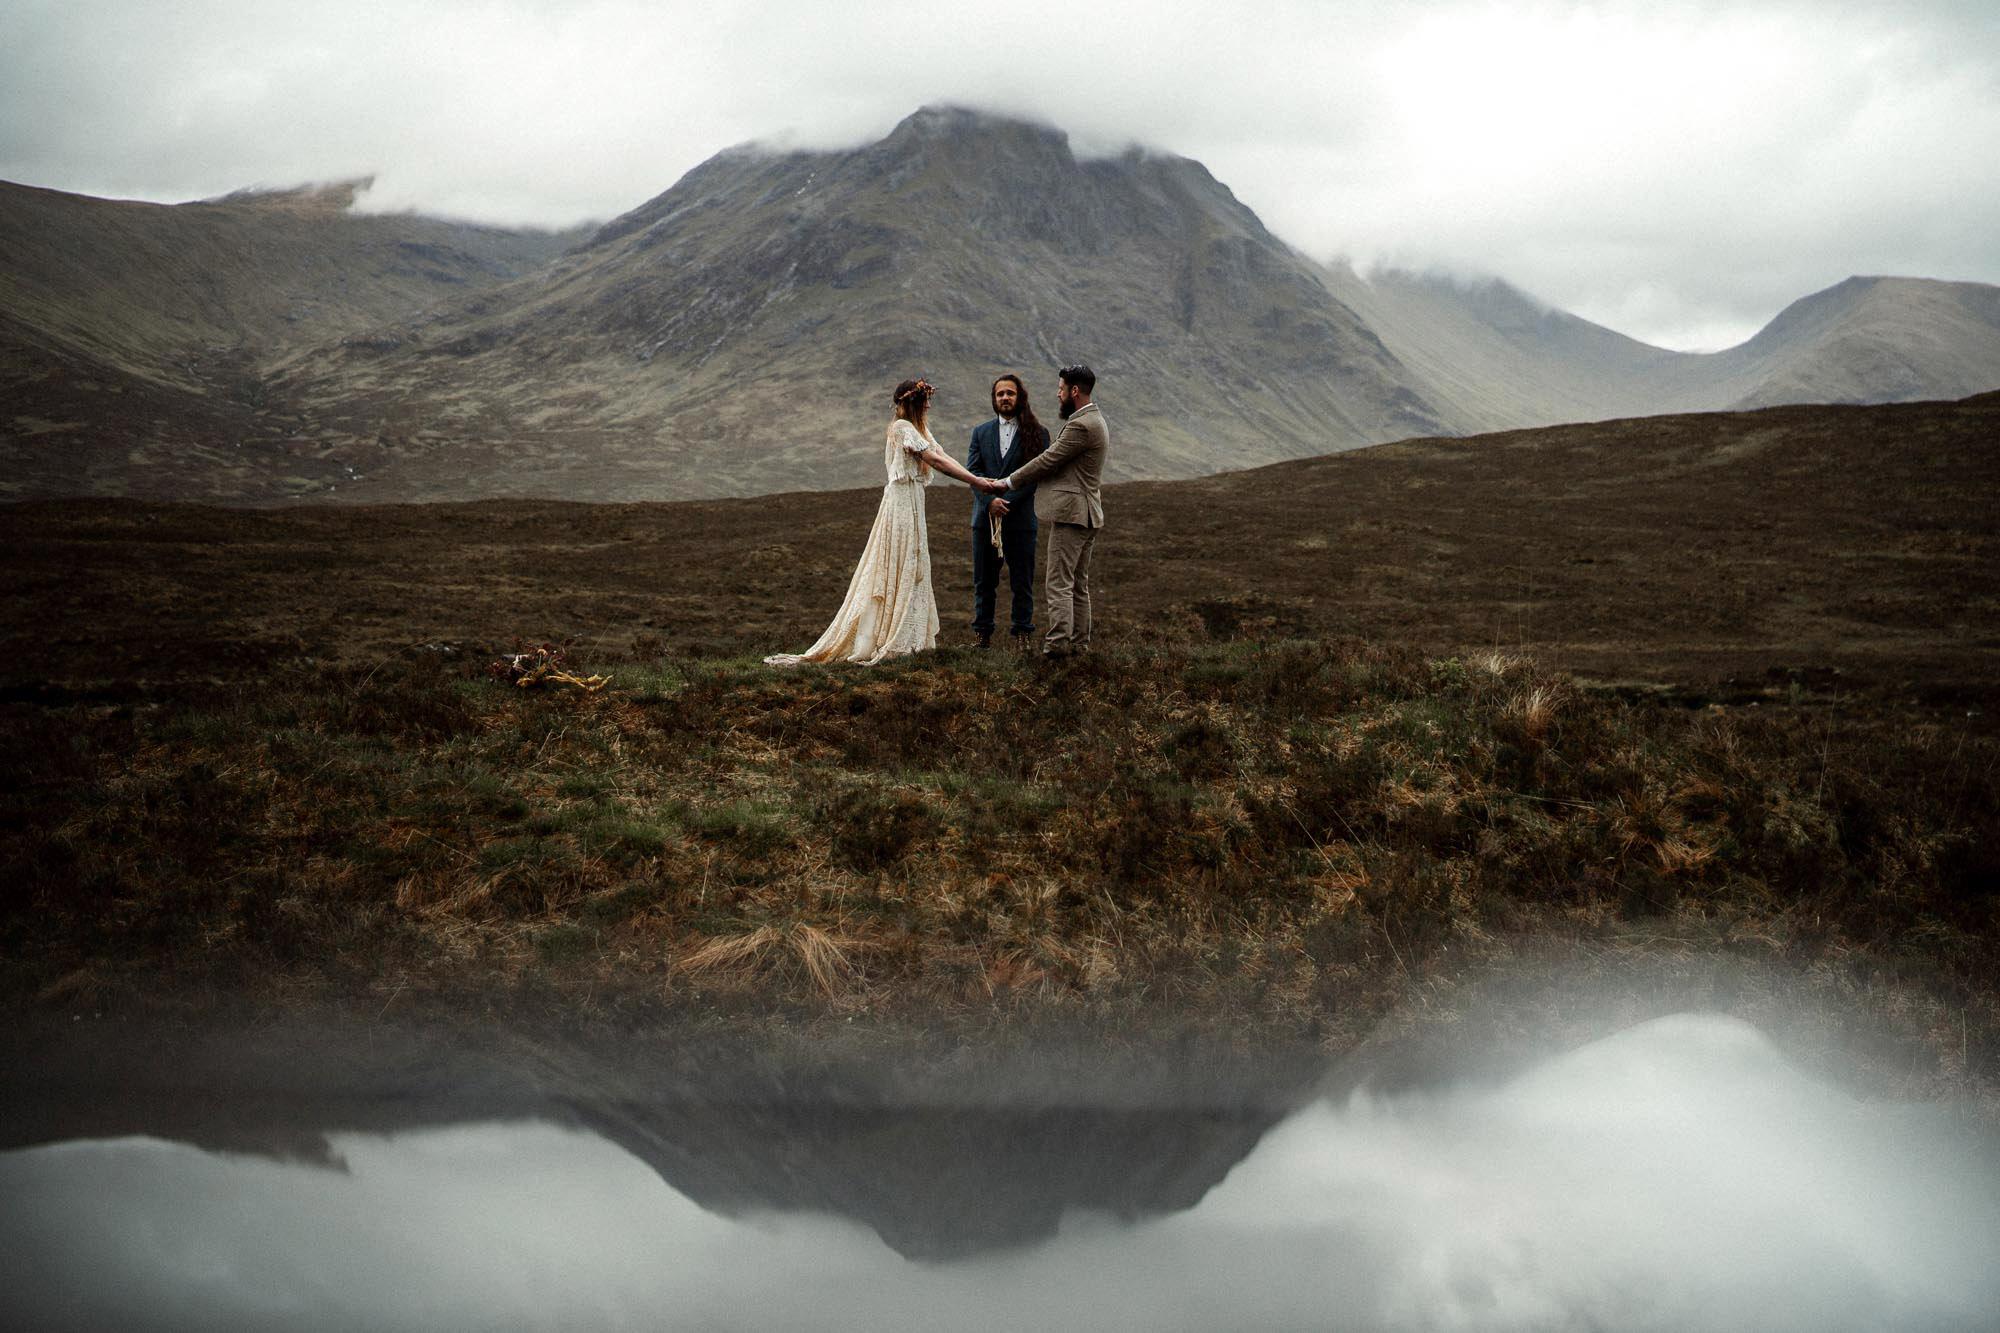 Hochzeitsfotografin Bettina Danzl